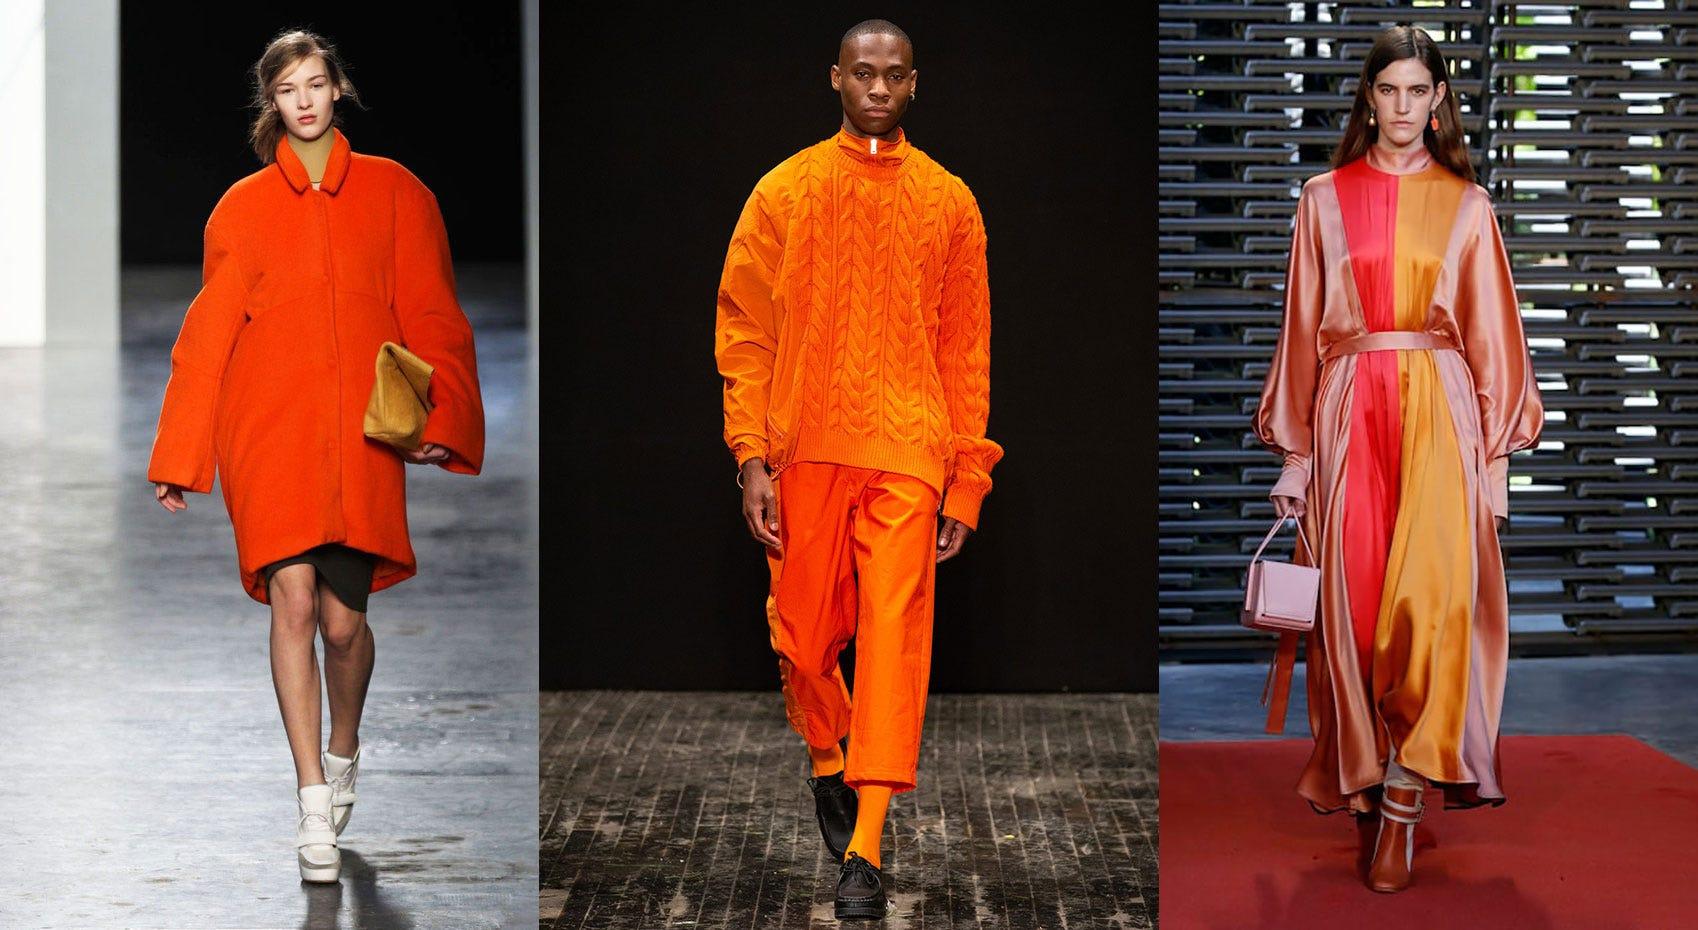 Spring/Summer 2019 Fashion Trends from London Fashion Week: 'Orange Overload'